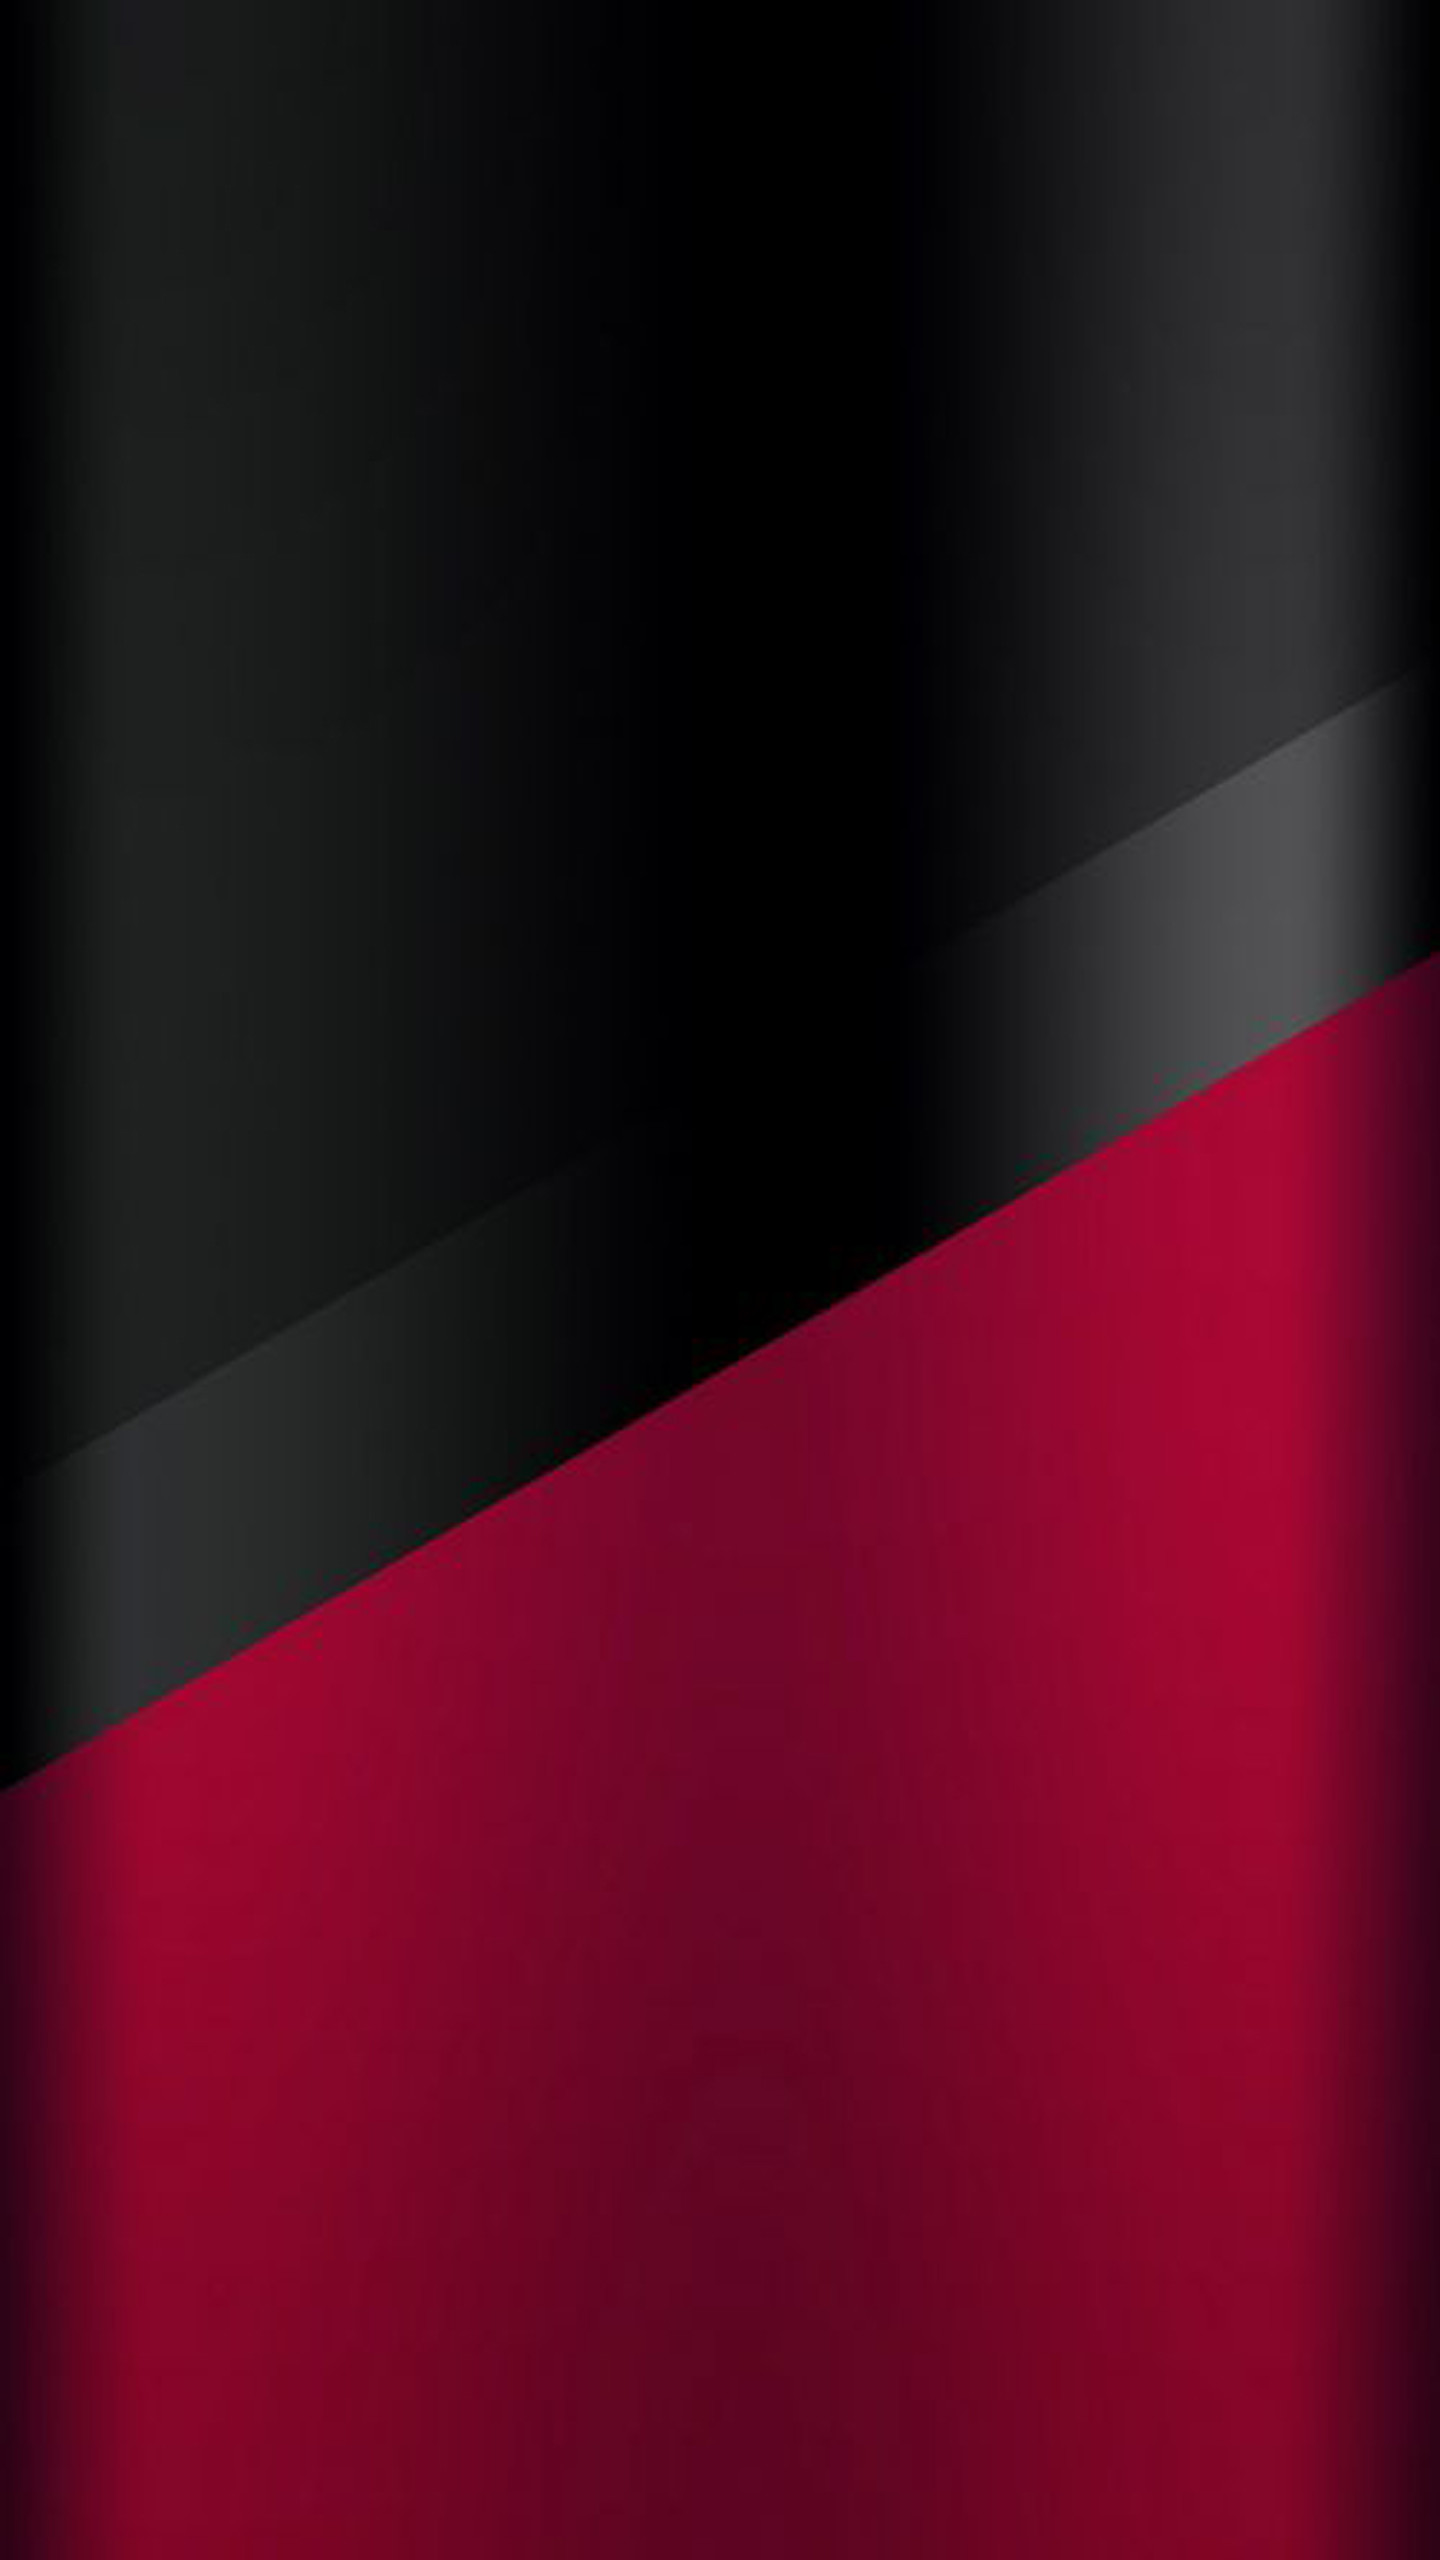 Artistic Curve Lights 03 Samsung Galaxy S7 Edge Wallpaper